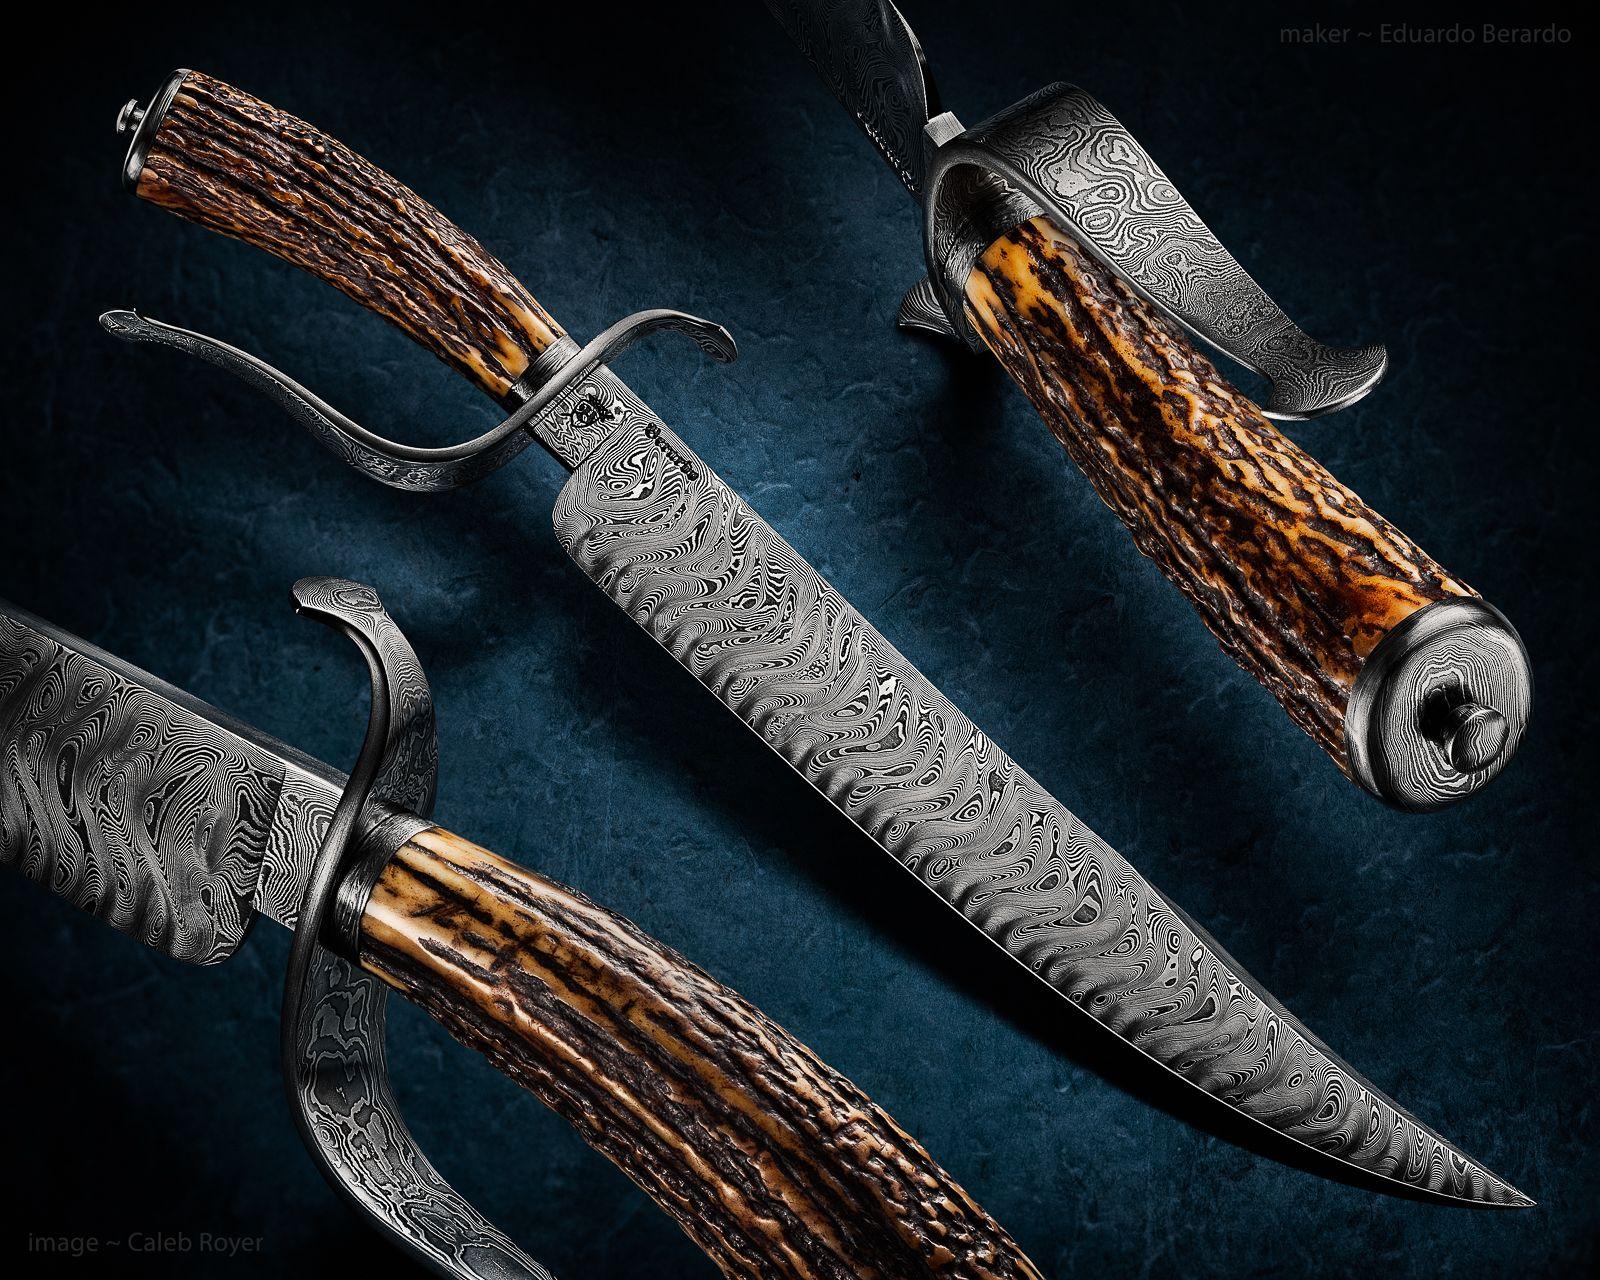 Fitzpatrick Bowie Knife